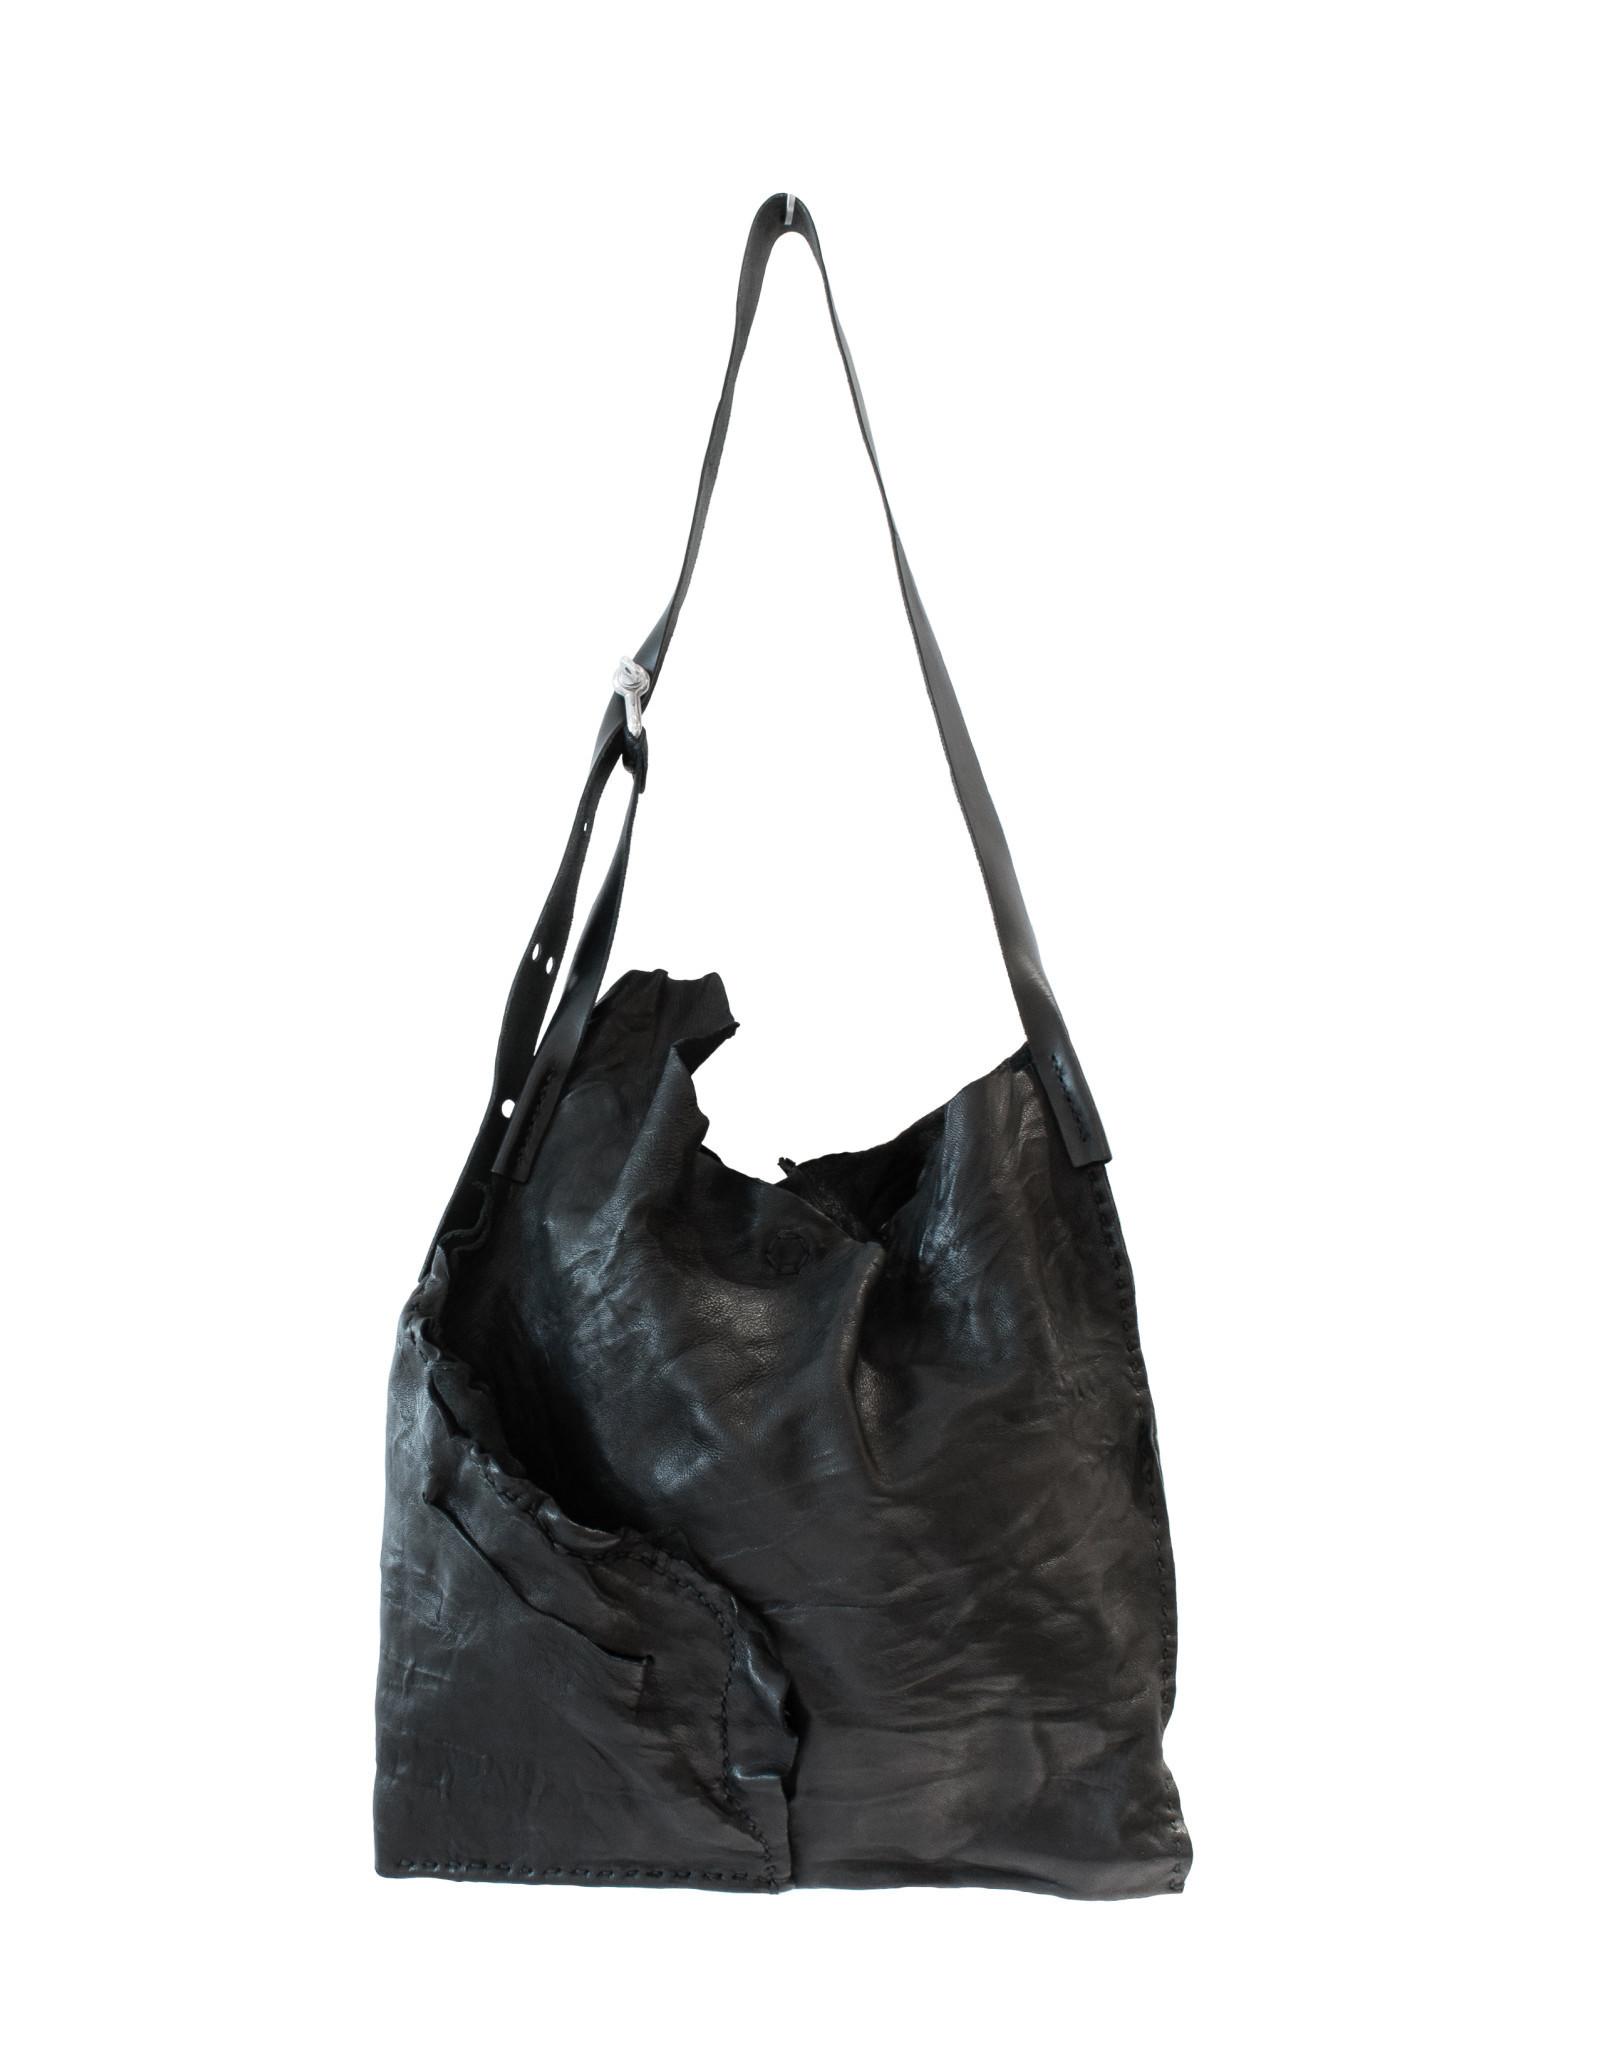 Engso Large, Folded One-Piece Bag - Black + Black